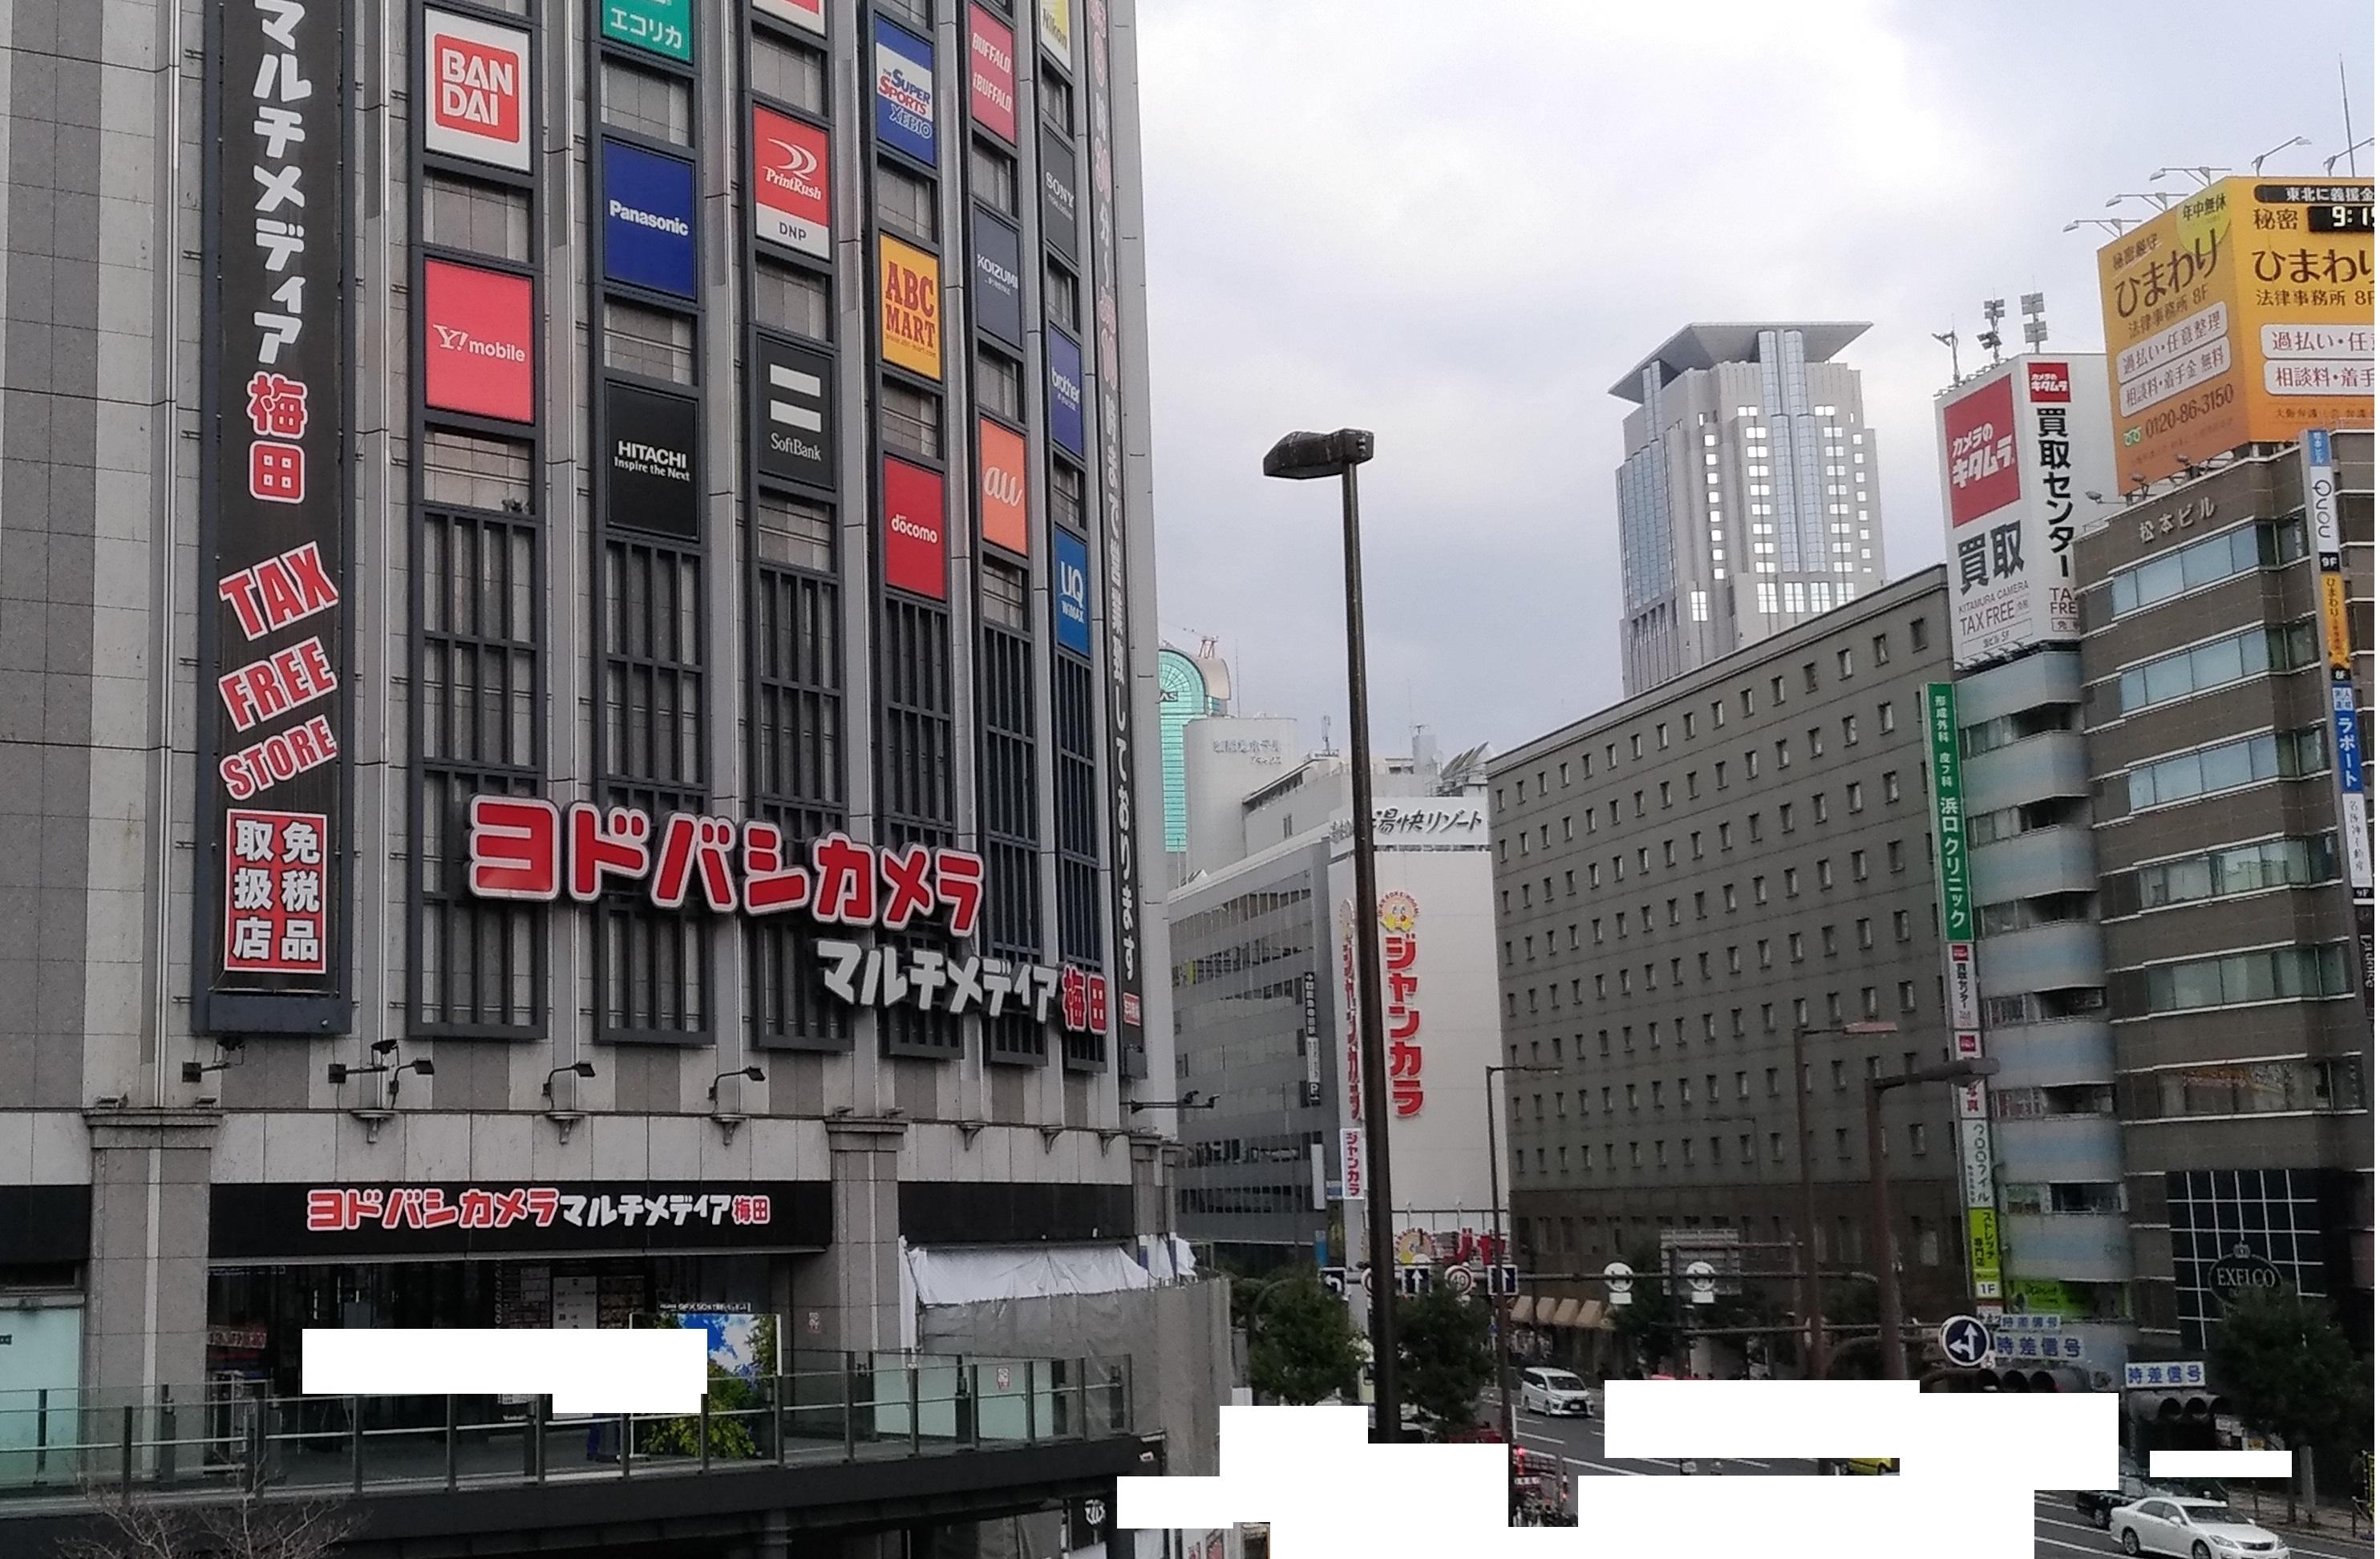 osaka_yodobashi_umeda_223.jpg